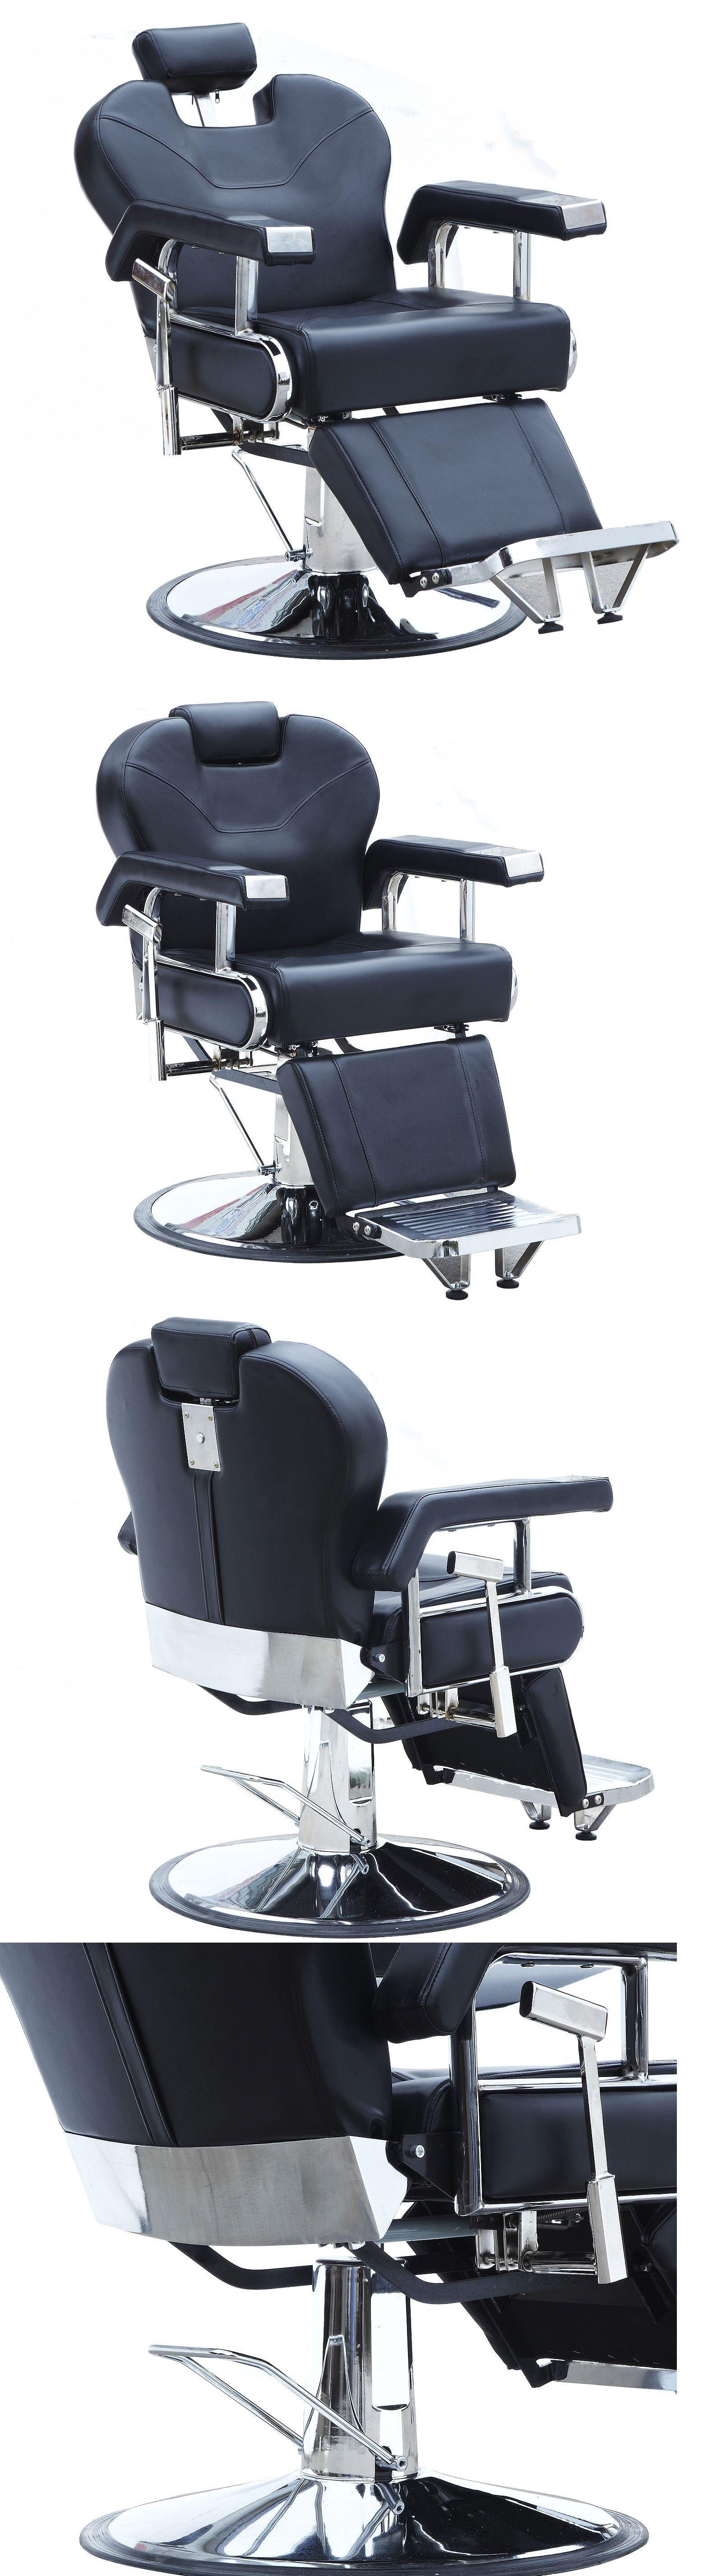 Salon and Spa Supplies Black Fashion Hydraulic Recline Barber